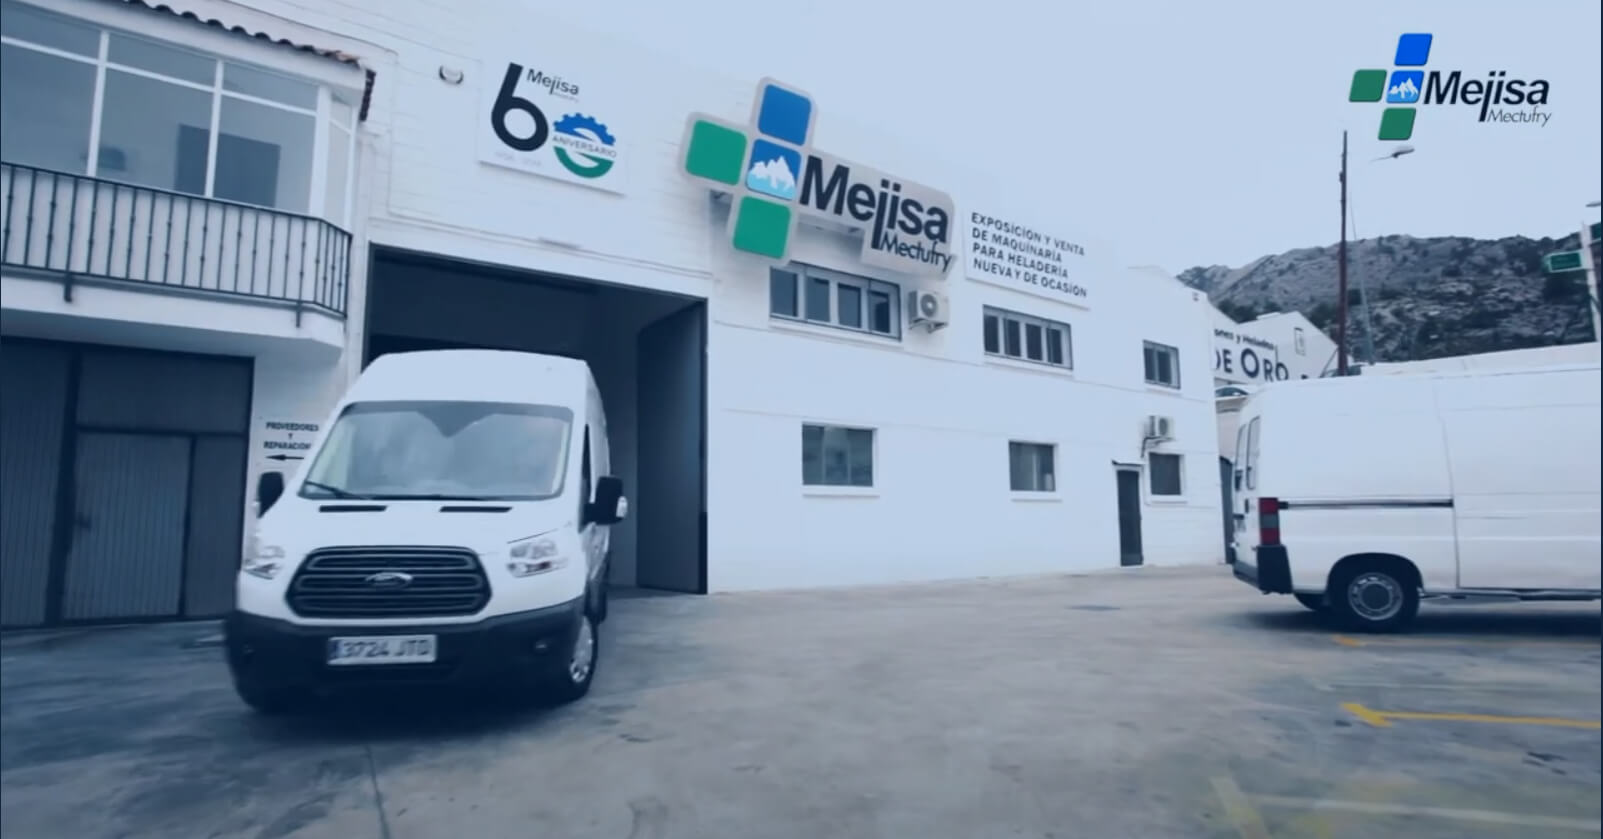 Mejisa-Mectufry-sa-fabrica